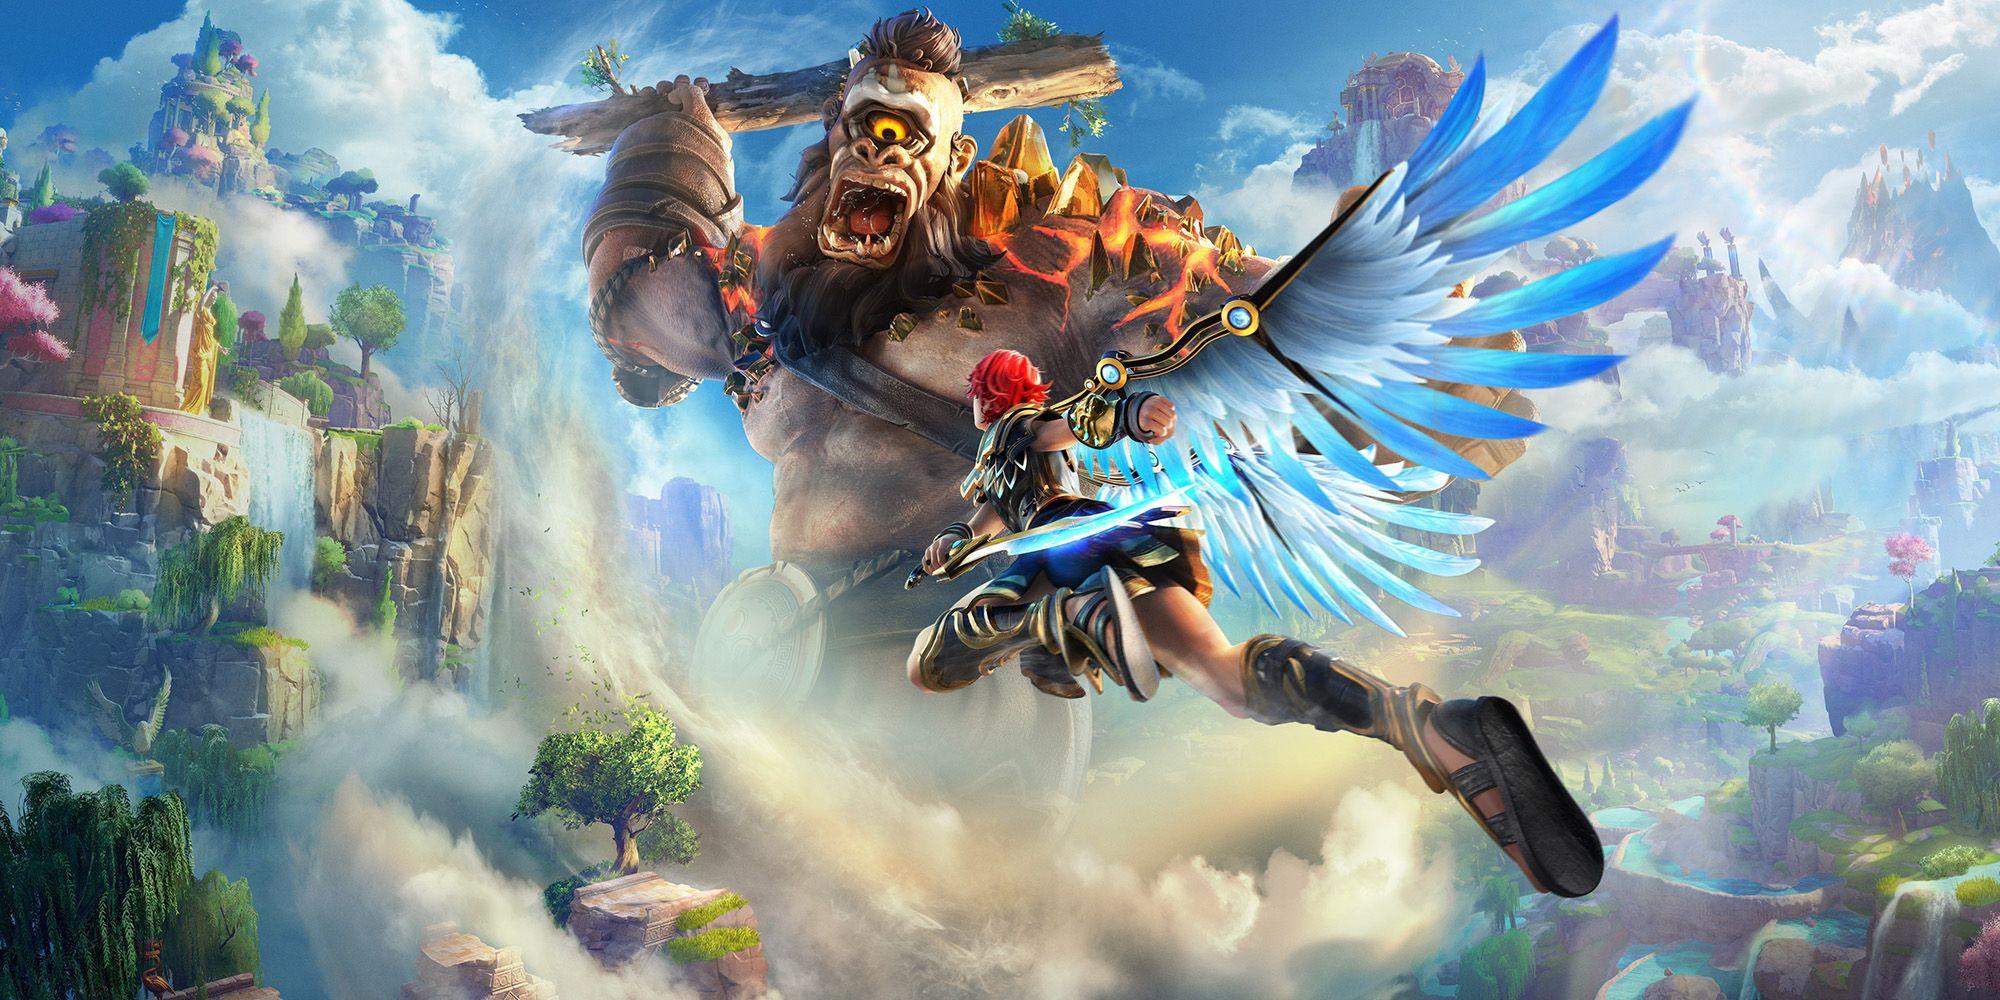 Immortals: Fenyx Rising - 5 Mythology-Based Games to Play While You Wait